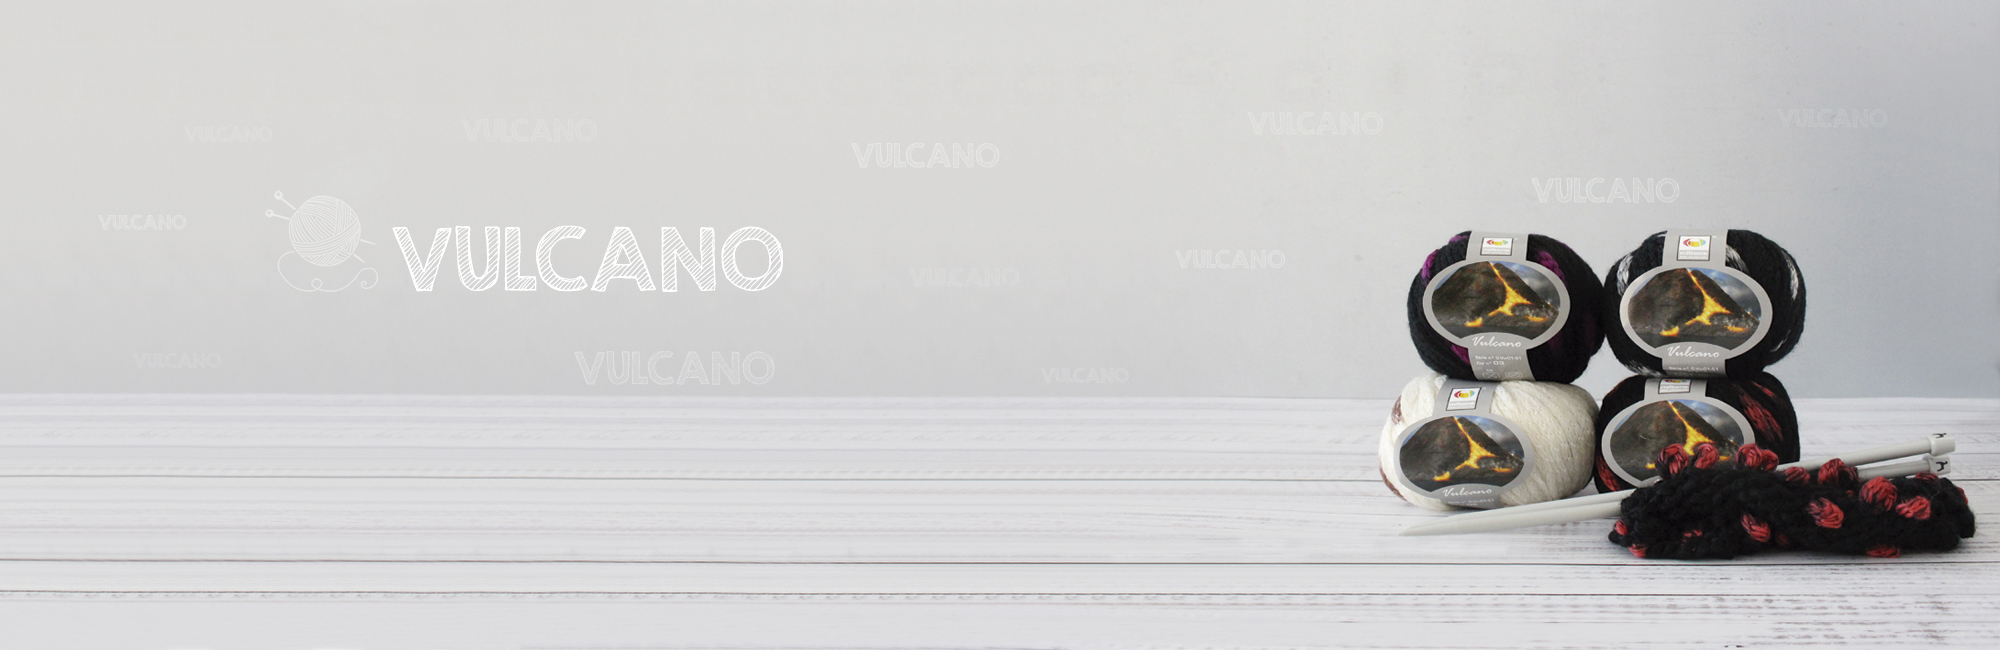 vulcano_2000x650px